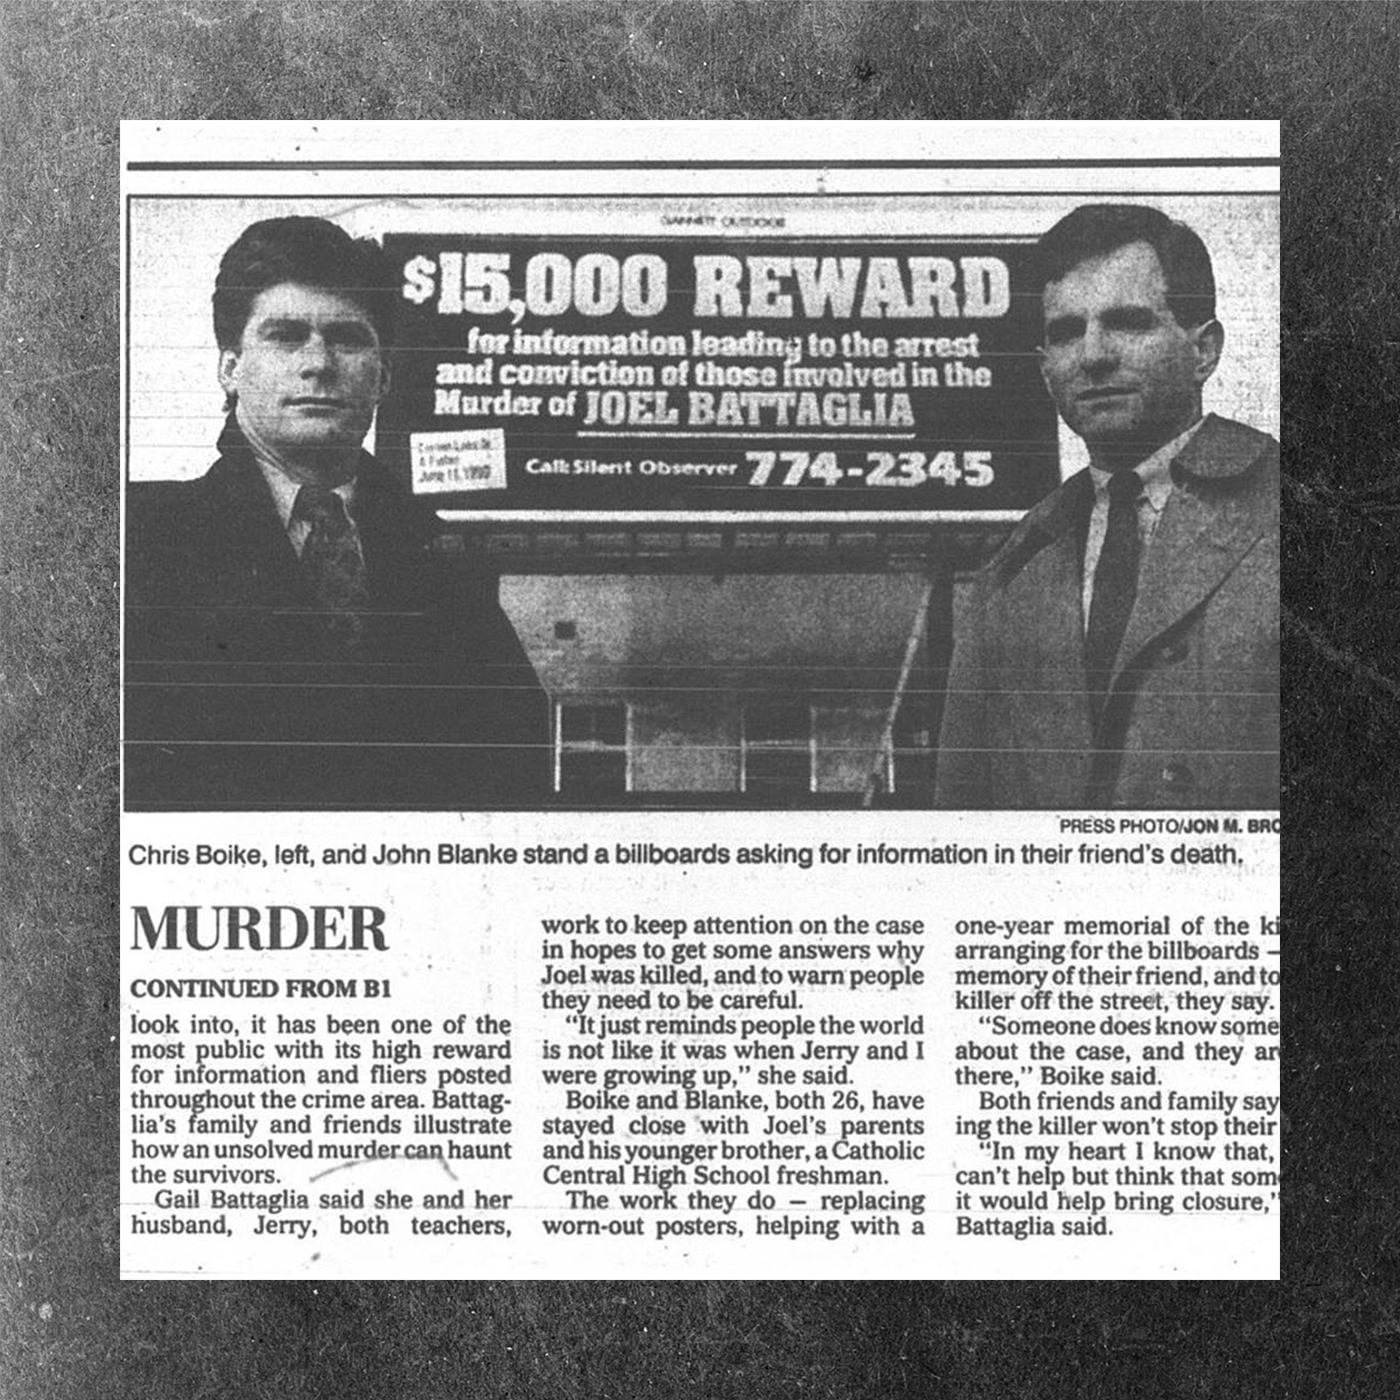 Grand Rapids Press clippings